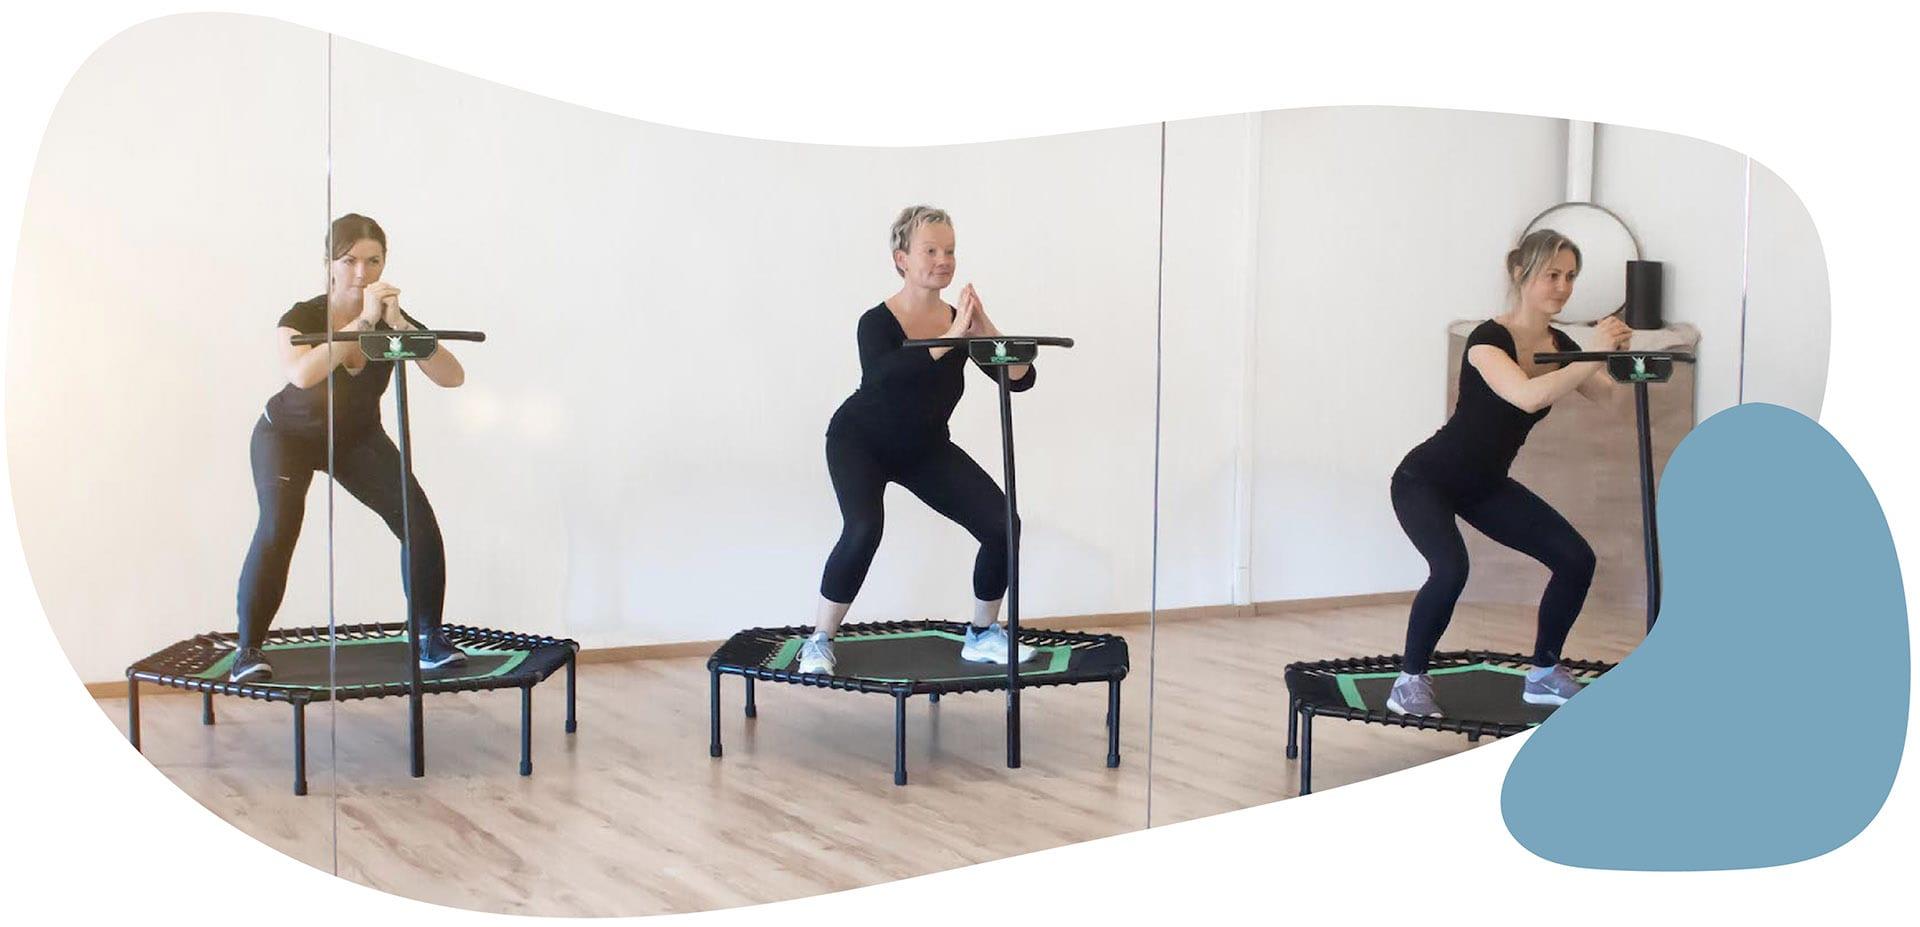 Femme Motion - Kurse Titelbild - Trainerinnen am Trampolin - Jumping Kurse